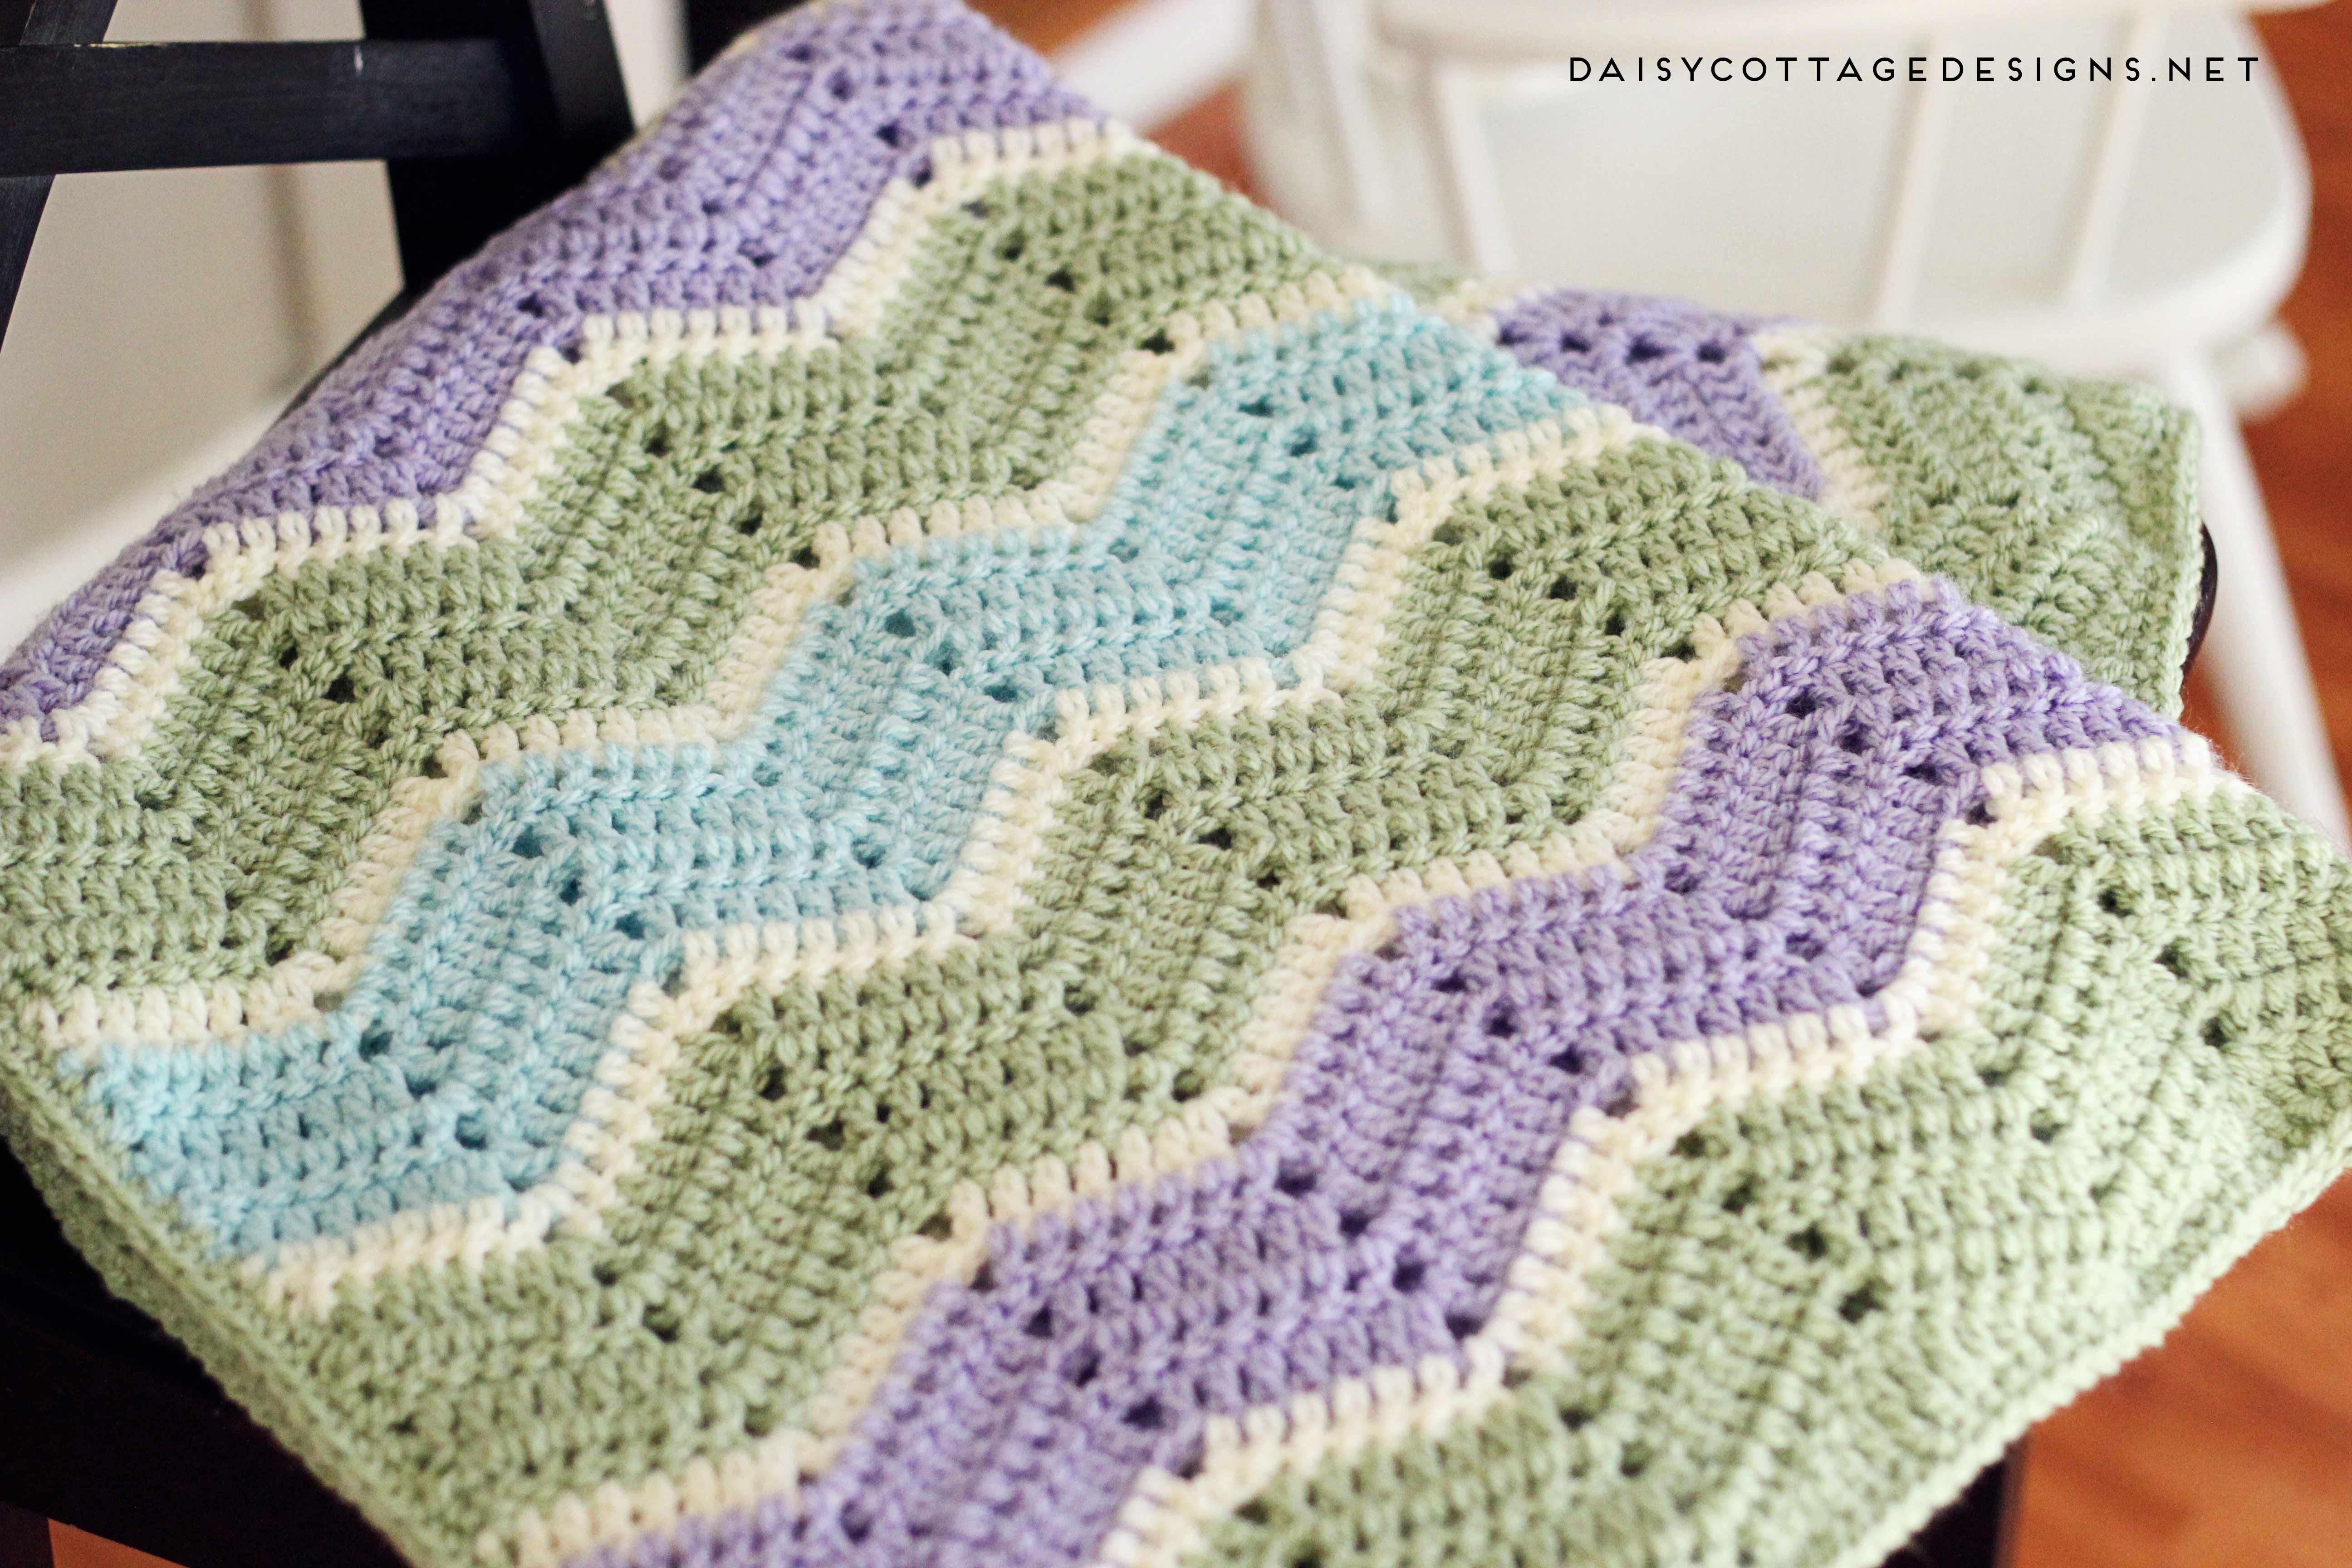 Crochet designs & patterns!!!